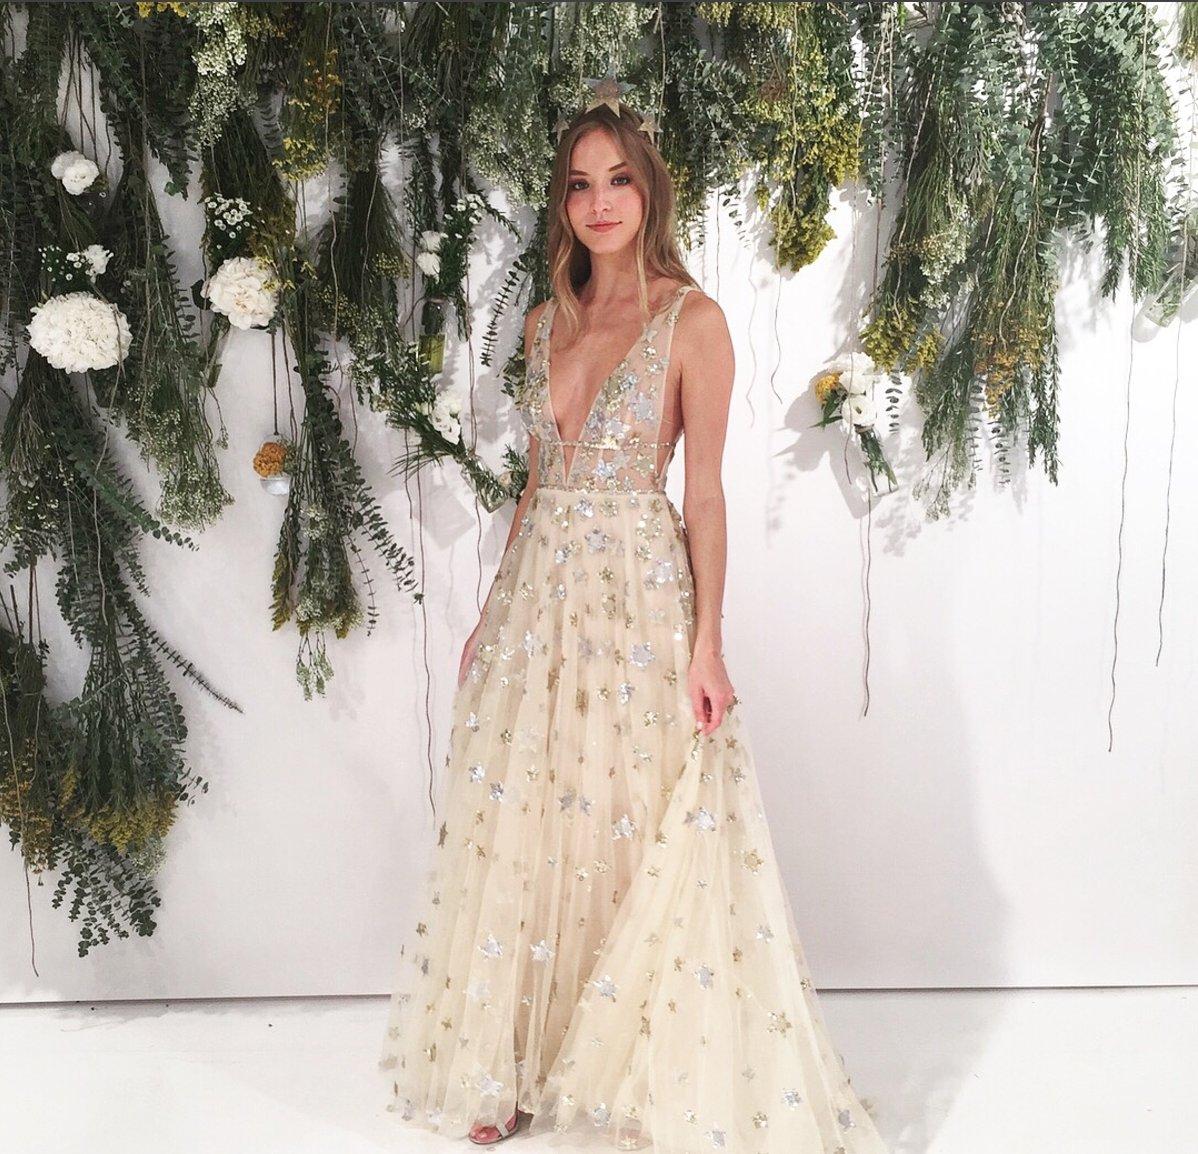 The best of Saturday comin' atcha! #nybfw #bridalfashionweek #bridalmarket #bridalgown #bridalfashion #bridesofaustin #austinbride #txbride https://t.co/8wCsI1JJre